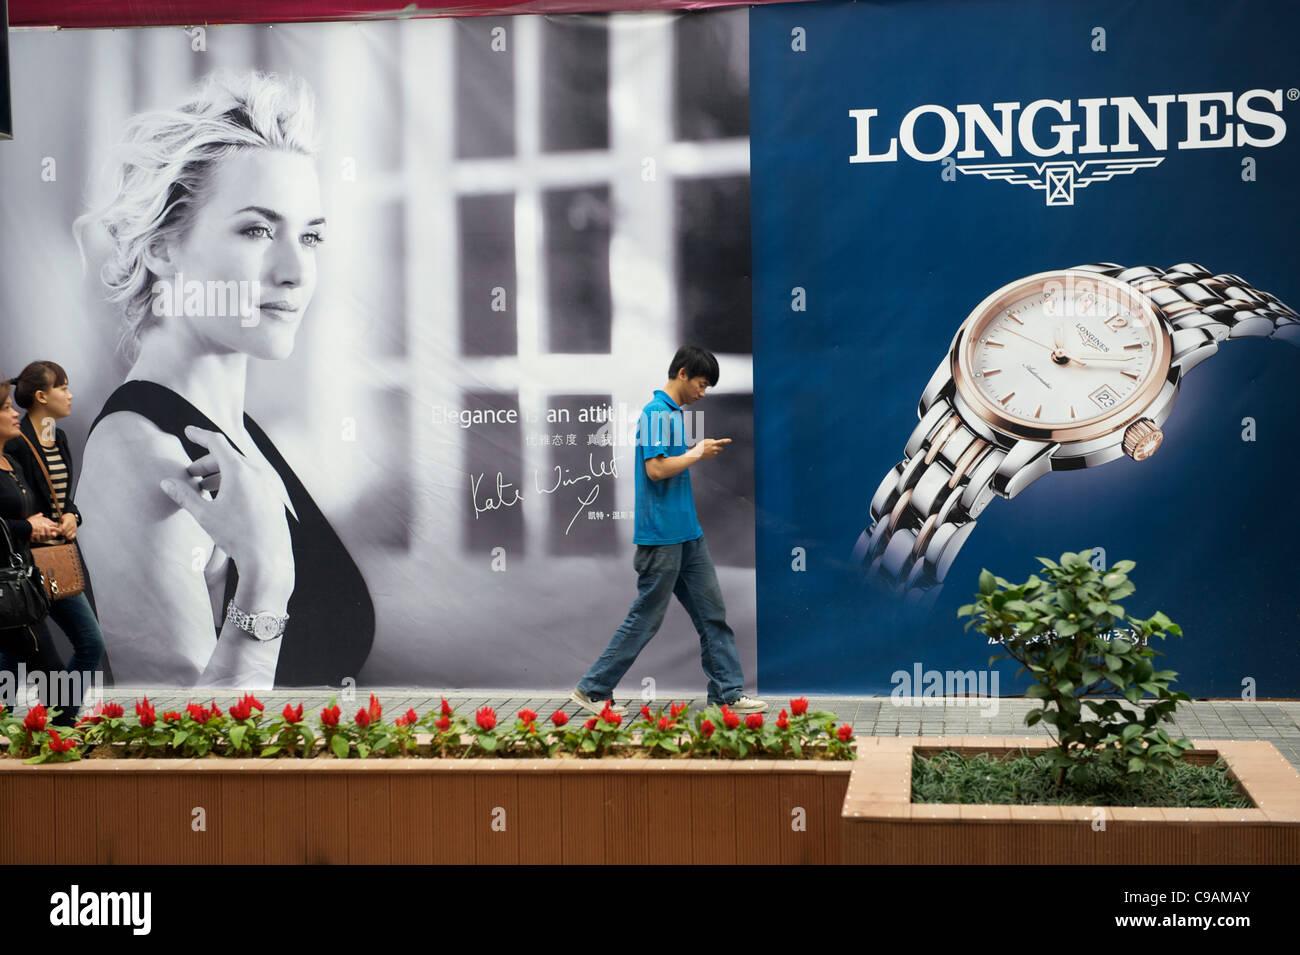 Longines Billboard in Wenzhou, Zhejiang, China. 15-Nov-2011 Stock Photo